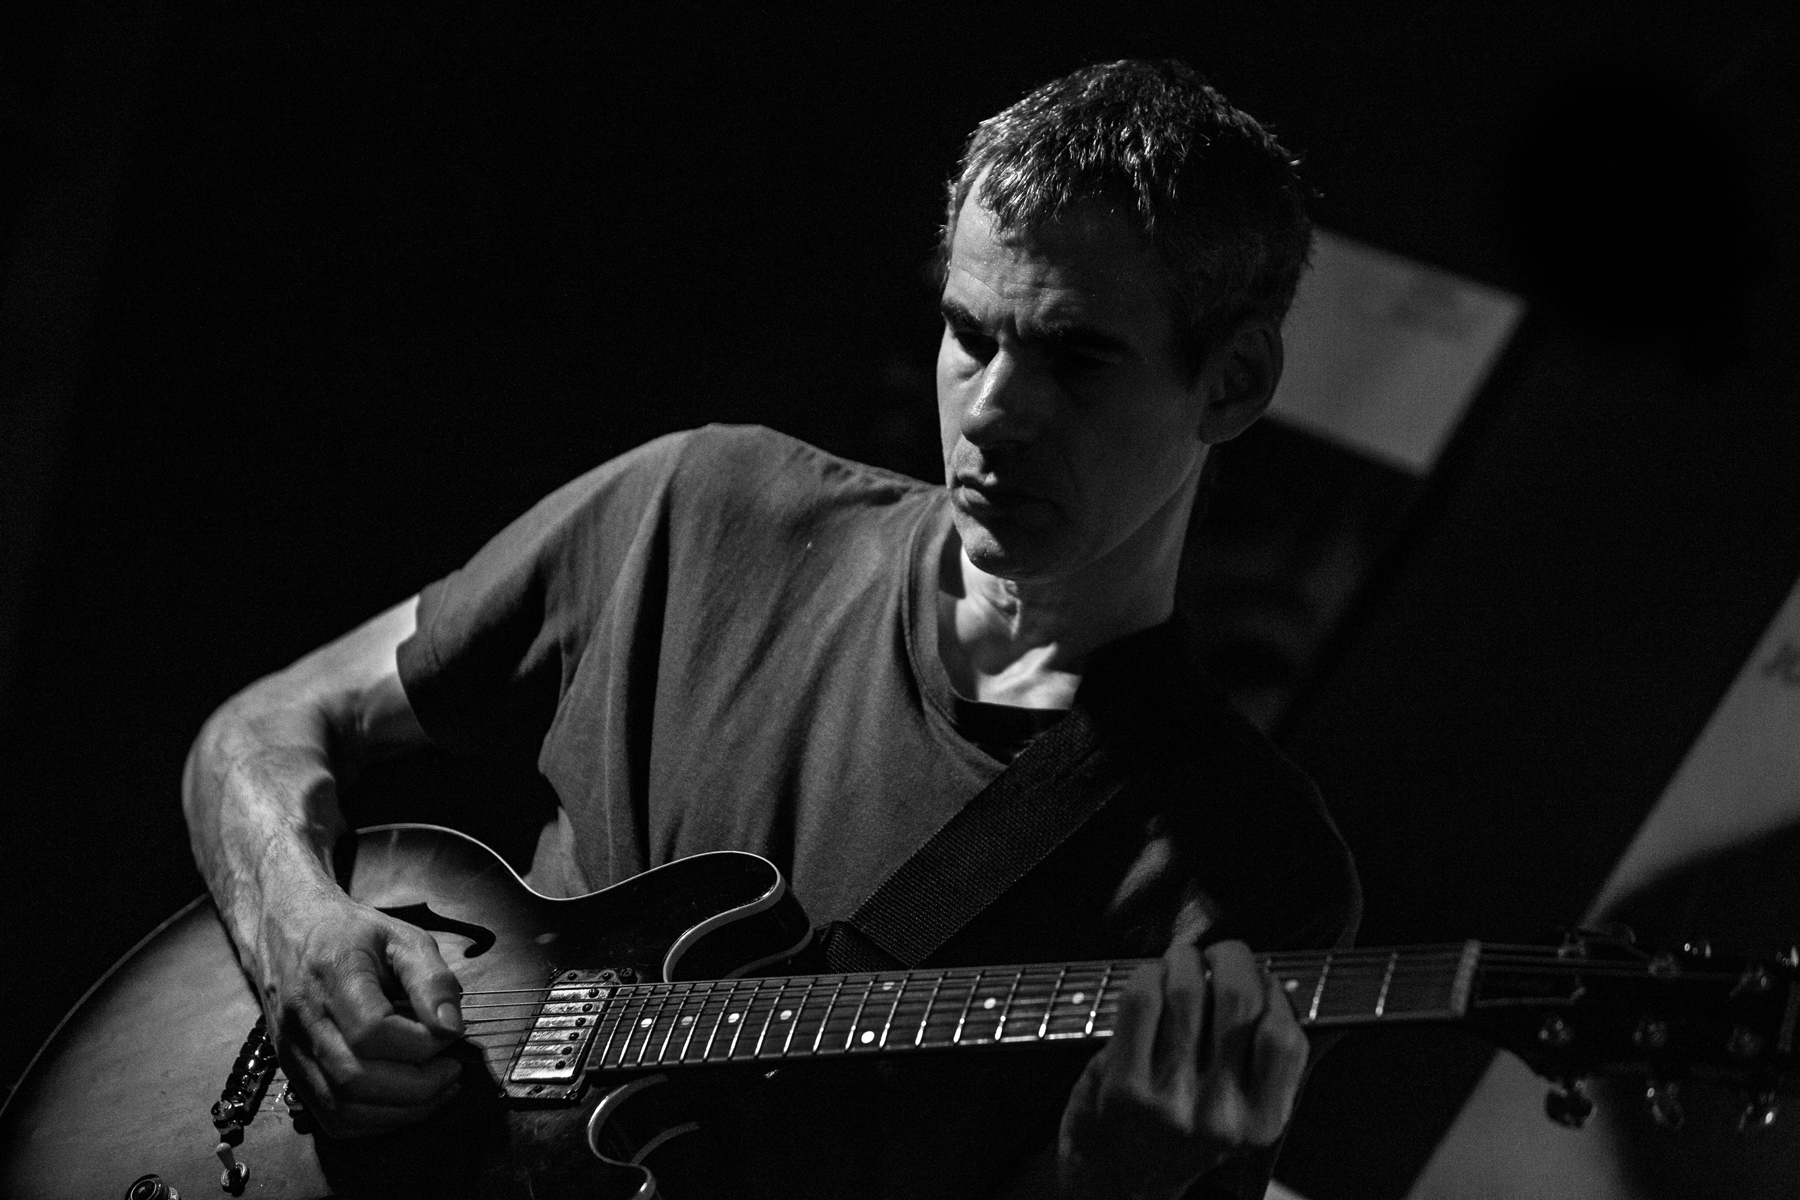 Hear 'Blackstar' Guitarist Ben Monder's Doomy Take on 'Goldfinger' Theme